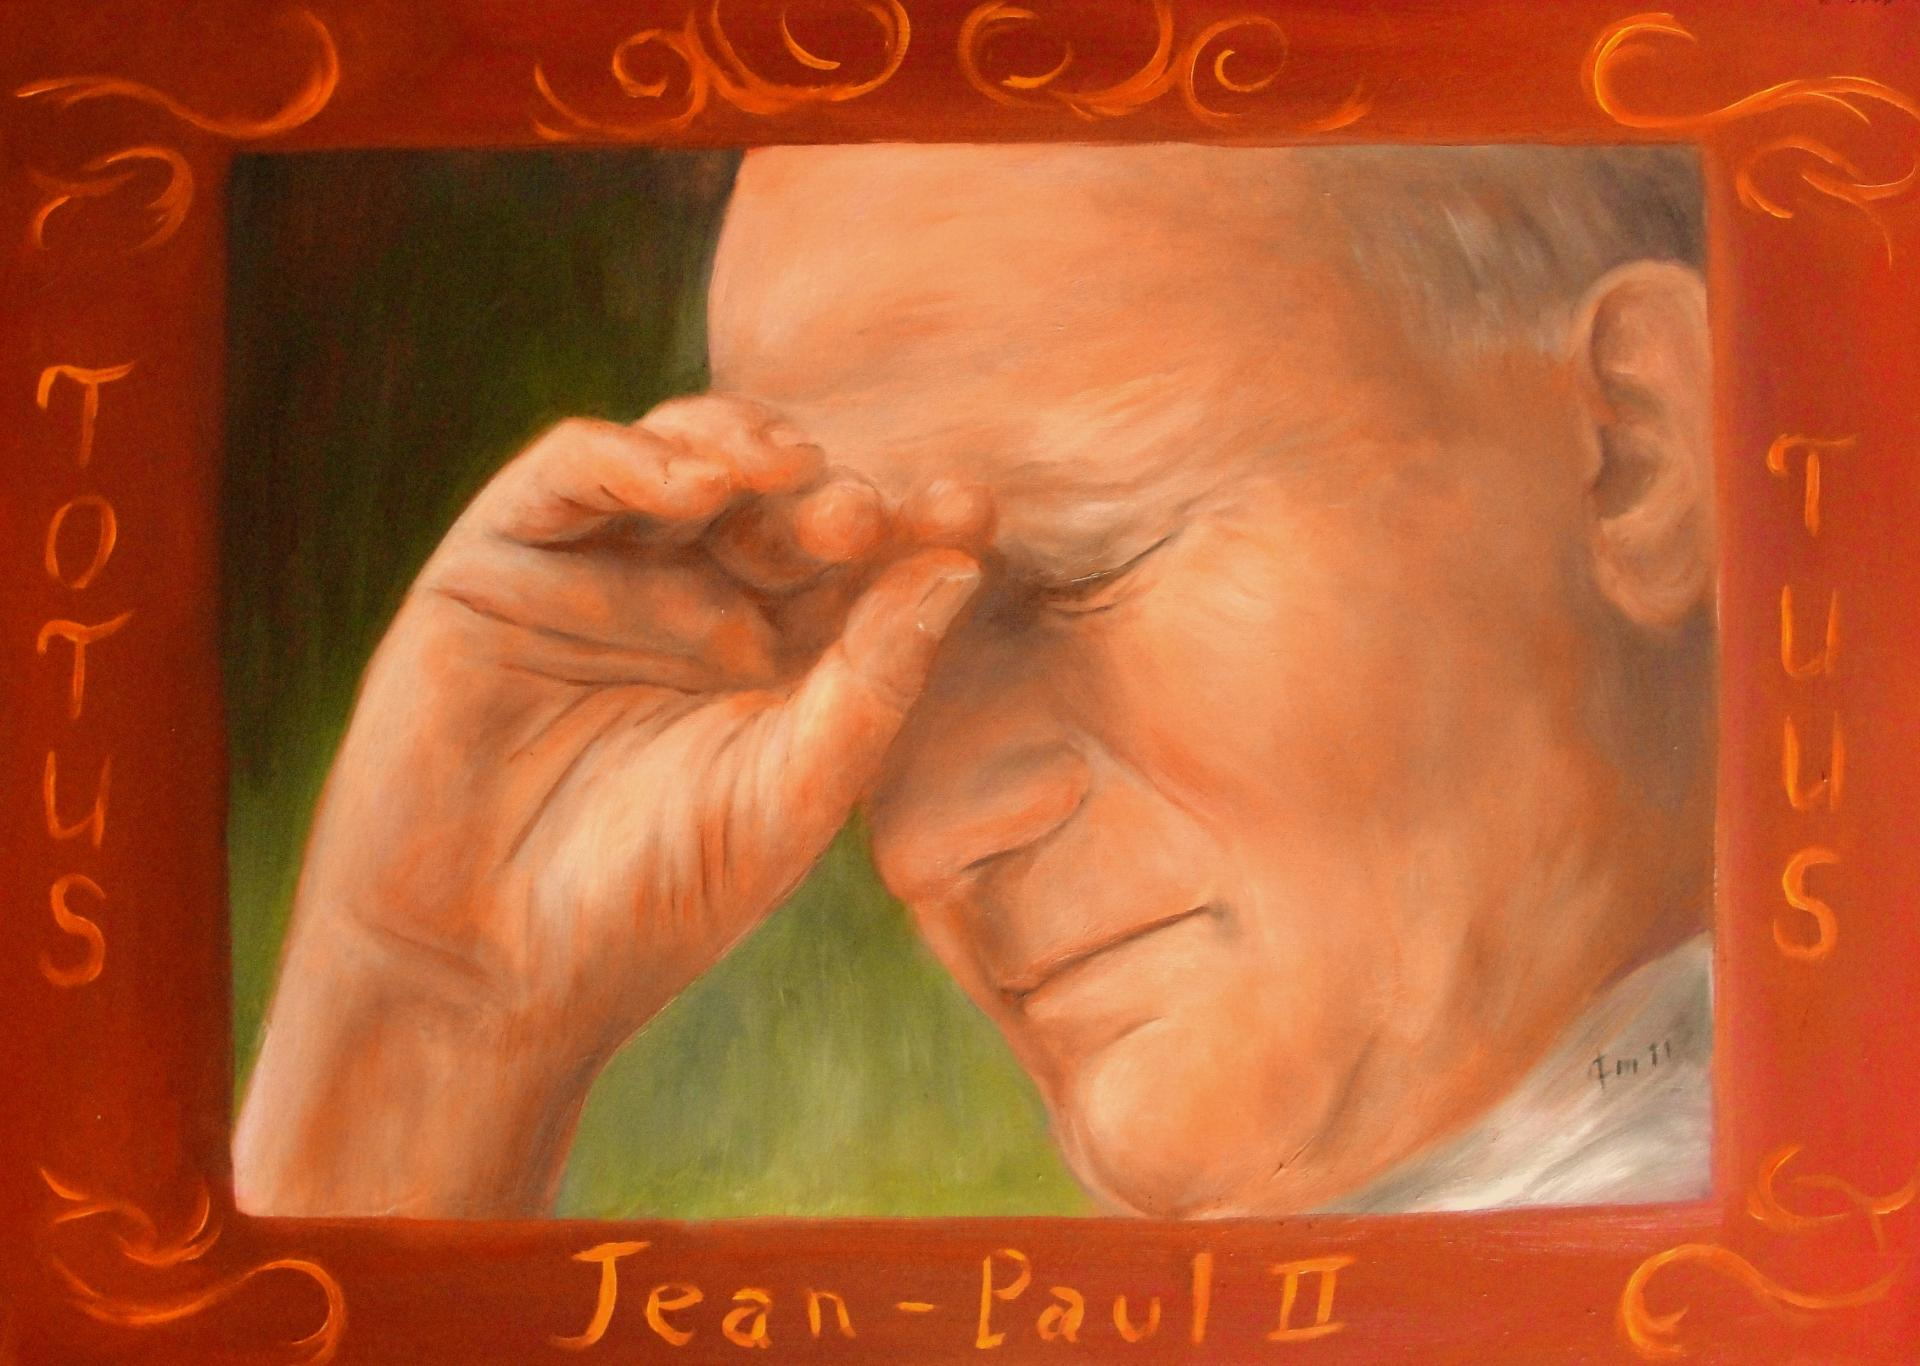 Jean paul ii peinture d art sacre de jean joseph chevalier